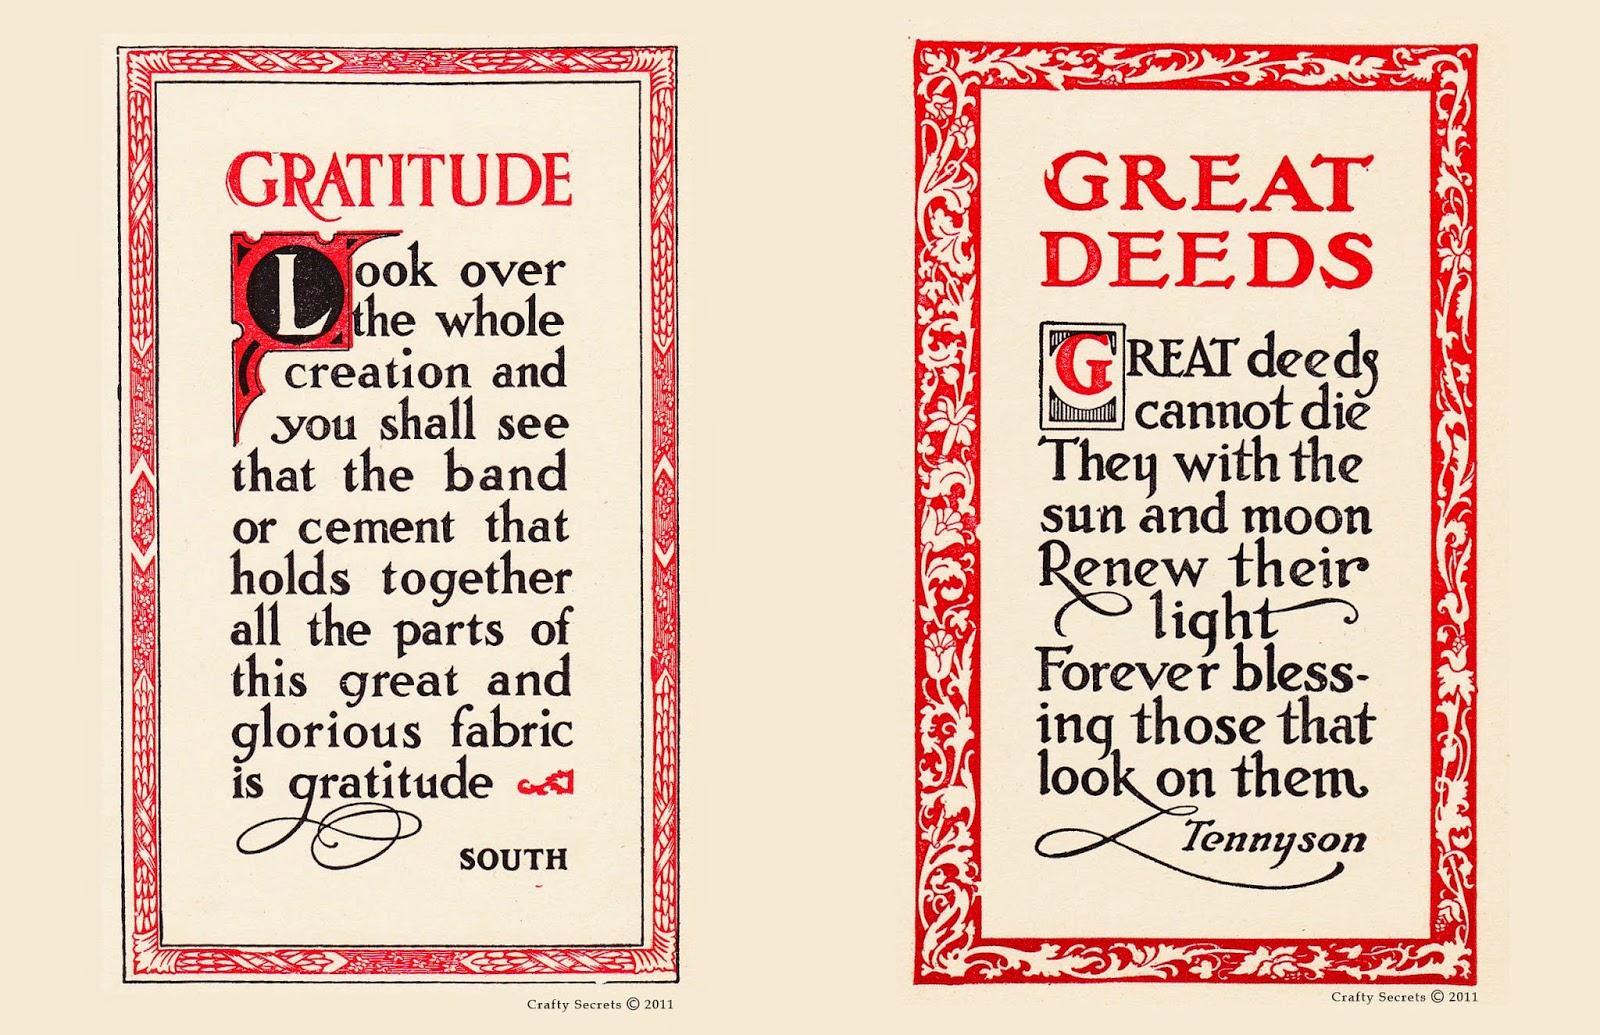 Gratitude Quotes: Crafty Secrets Heartwarming Vintage Ideas And Tips